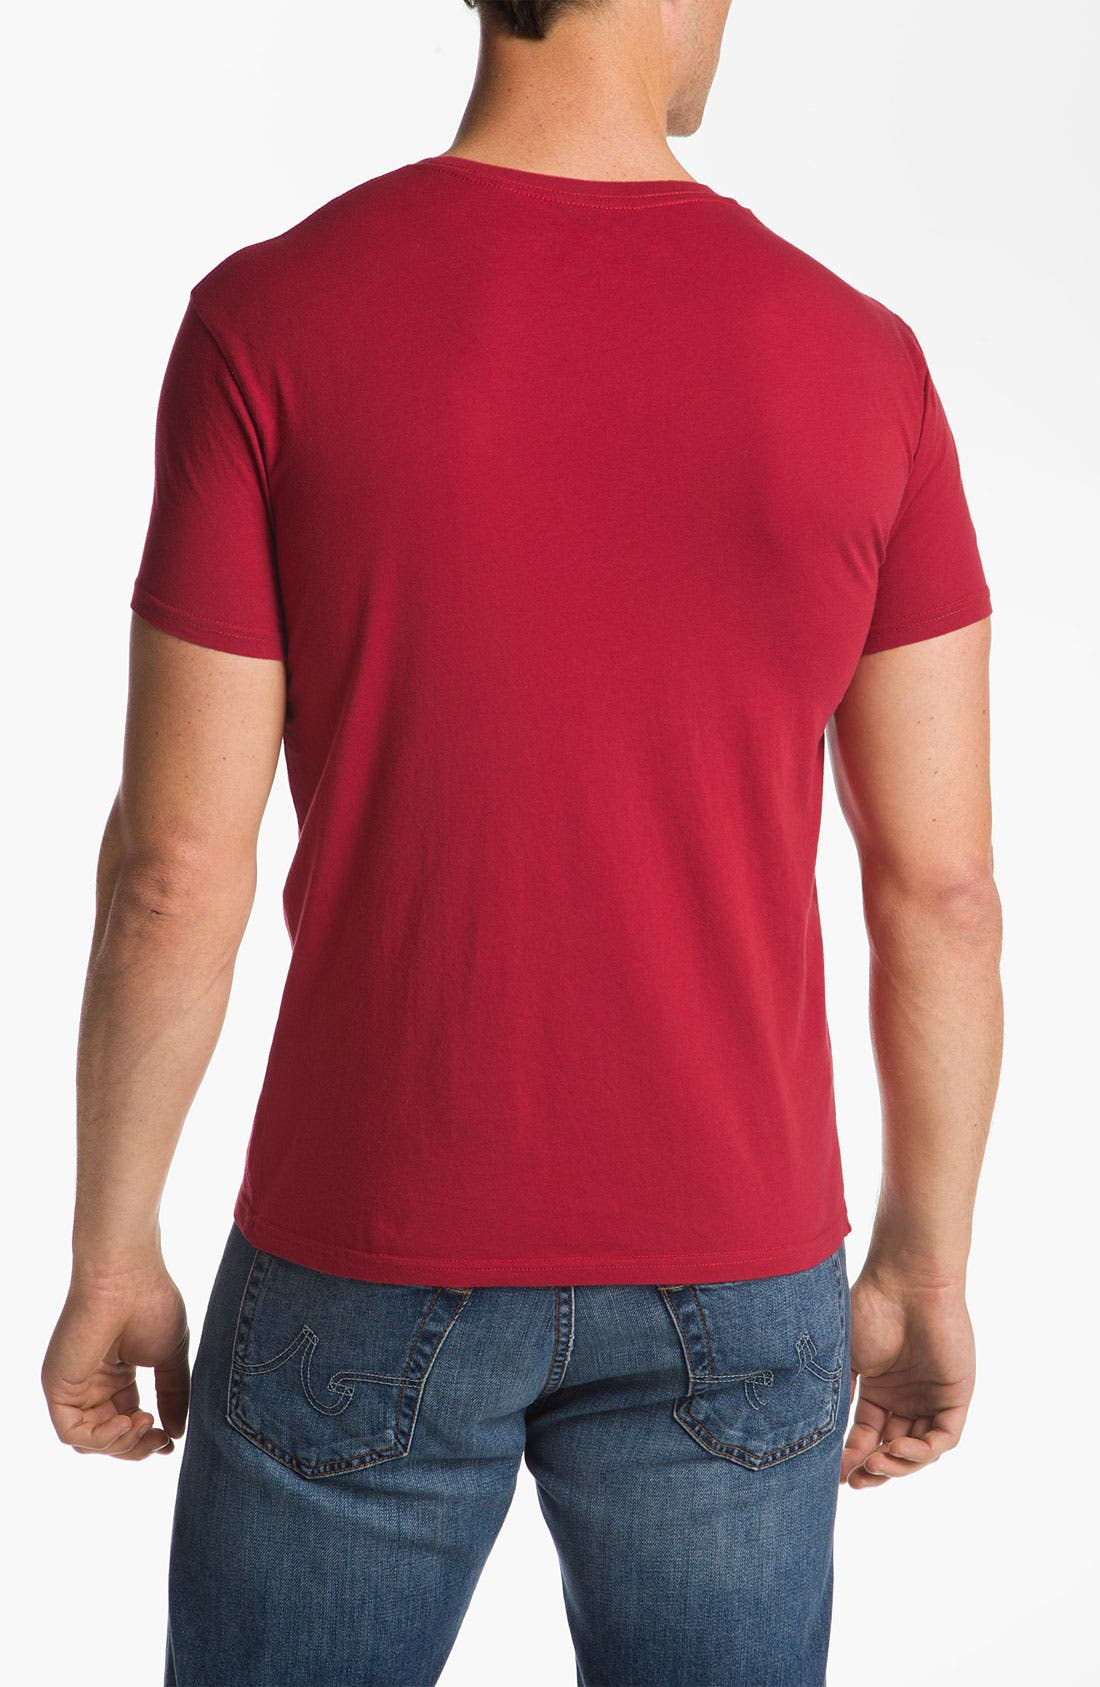 Alternate Image 2  - The Original Retro Brand 'Stanford Cardinal' T-Shirt